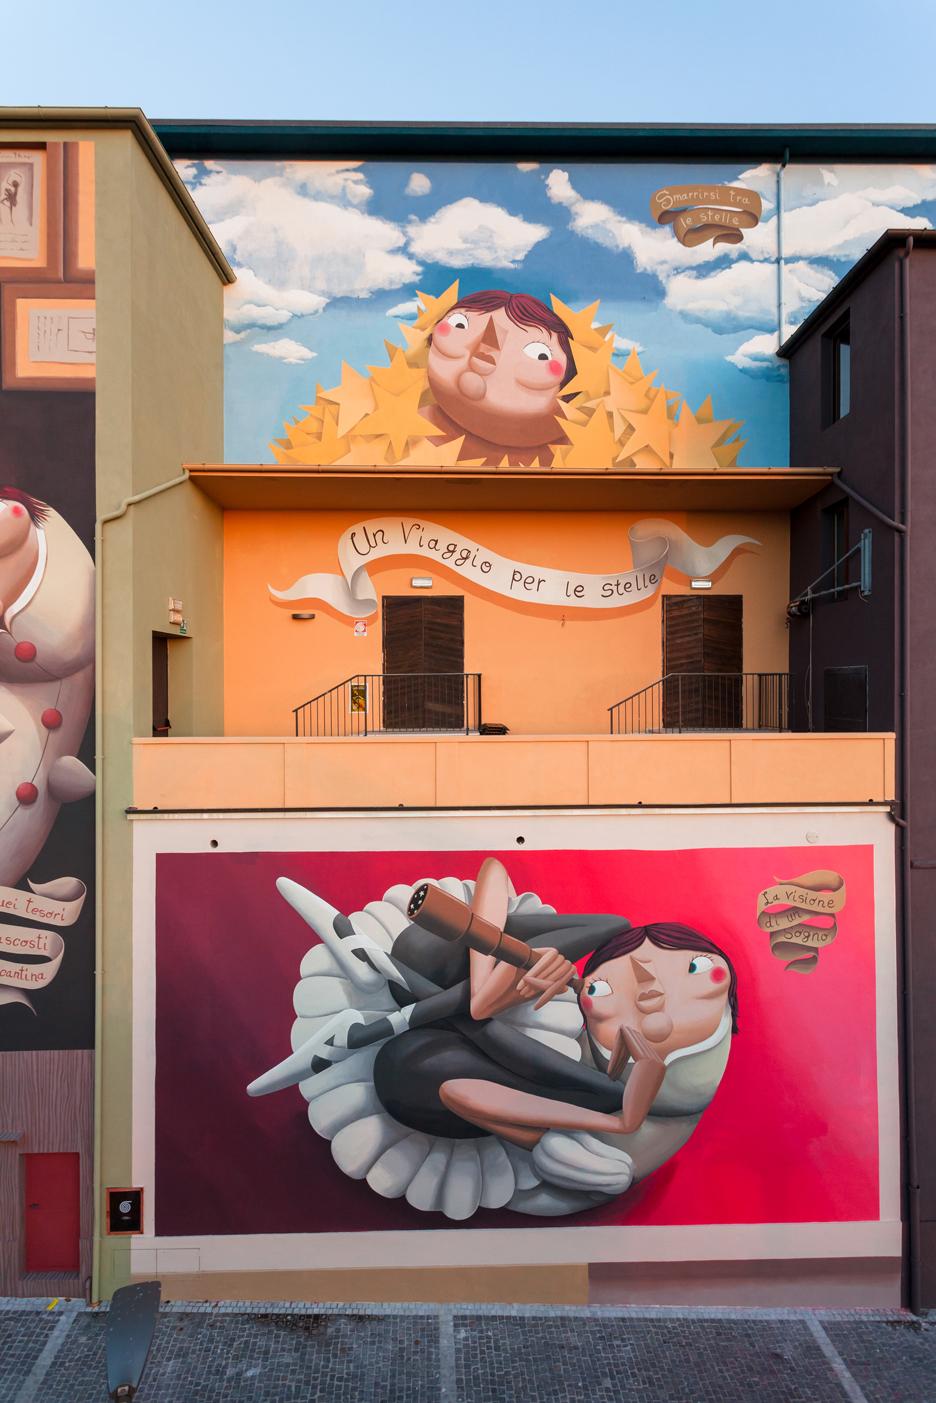 Zed1 Montegranaro Street Art